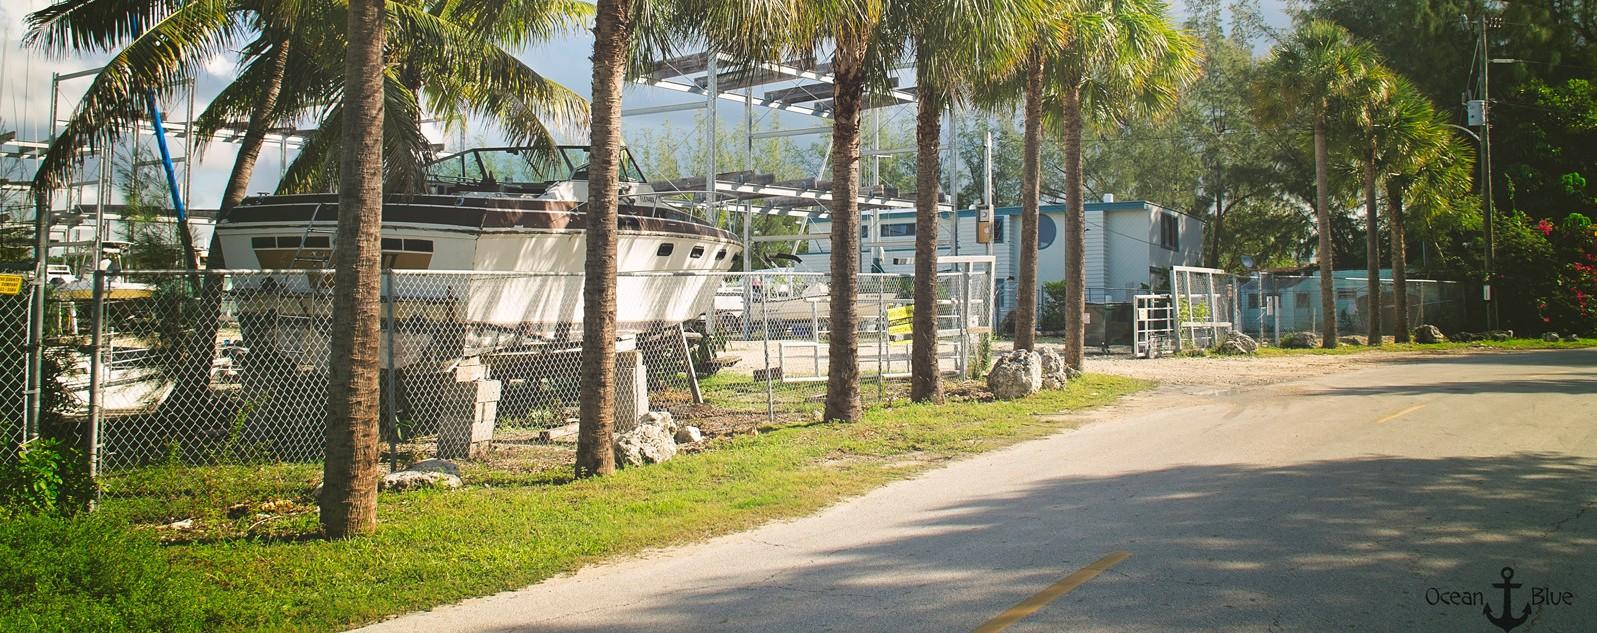 south florida boat ramp